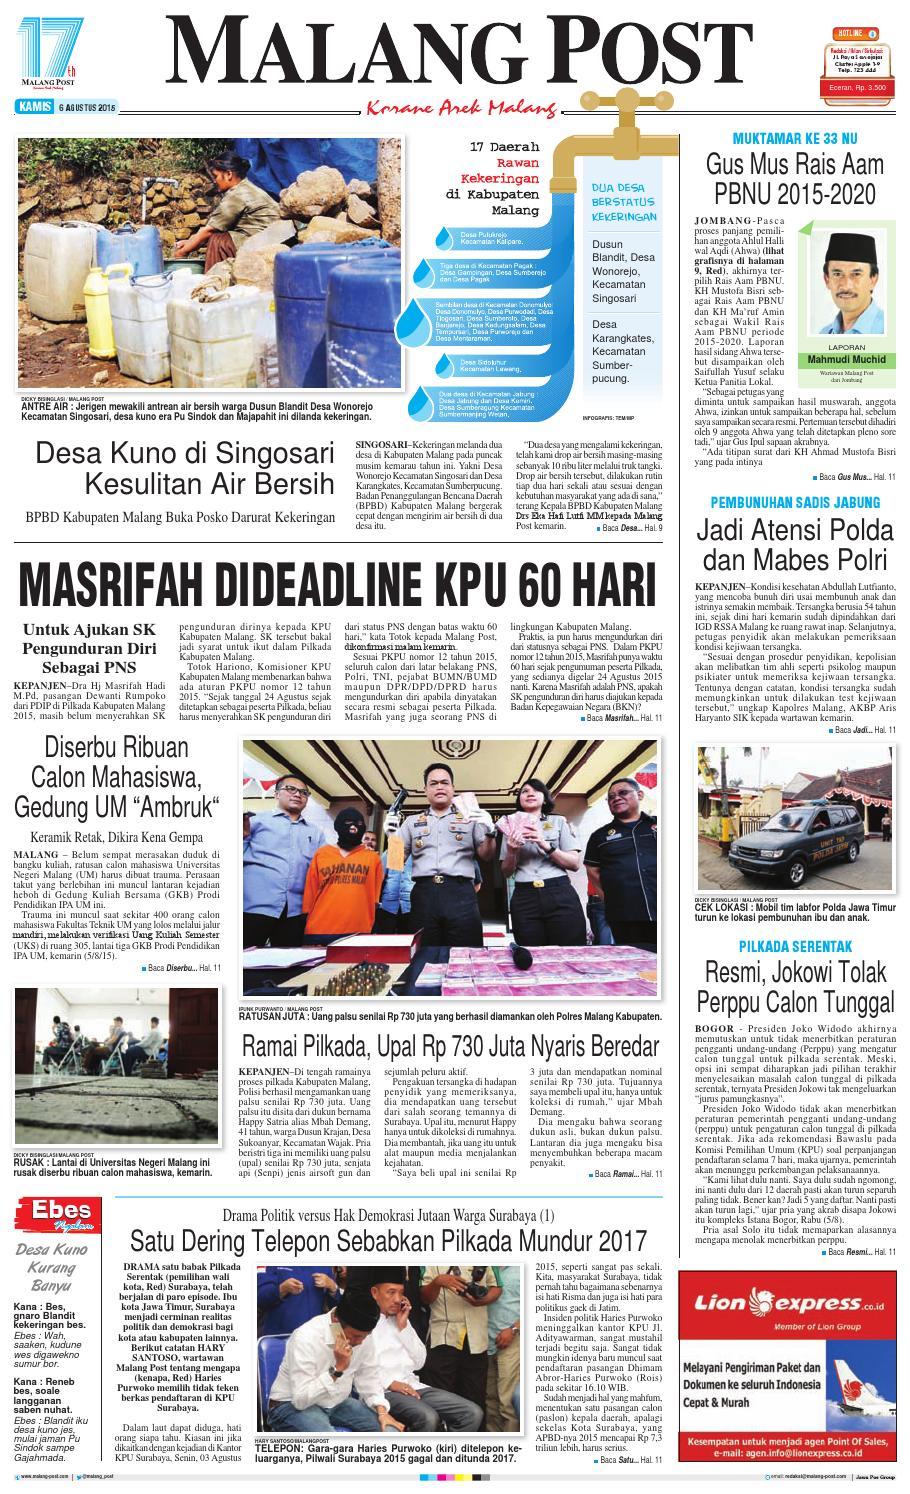 Mp0608 By Mpost Issuu Produk Ukm Bumn Kain Batik Middle Premium Sutera